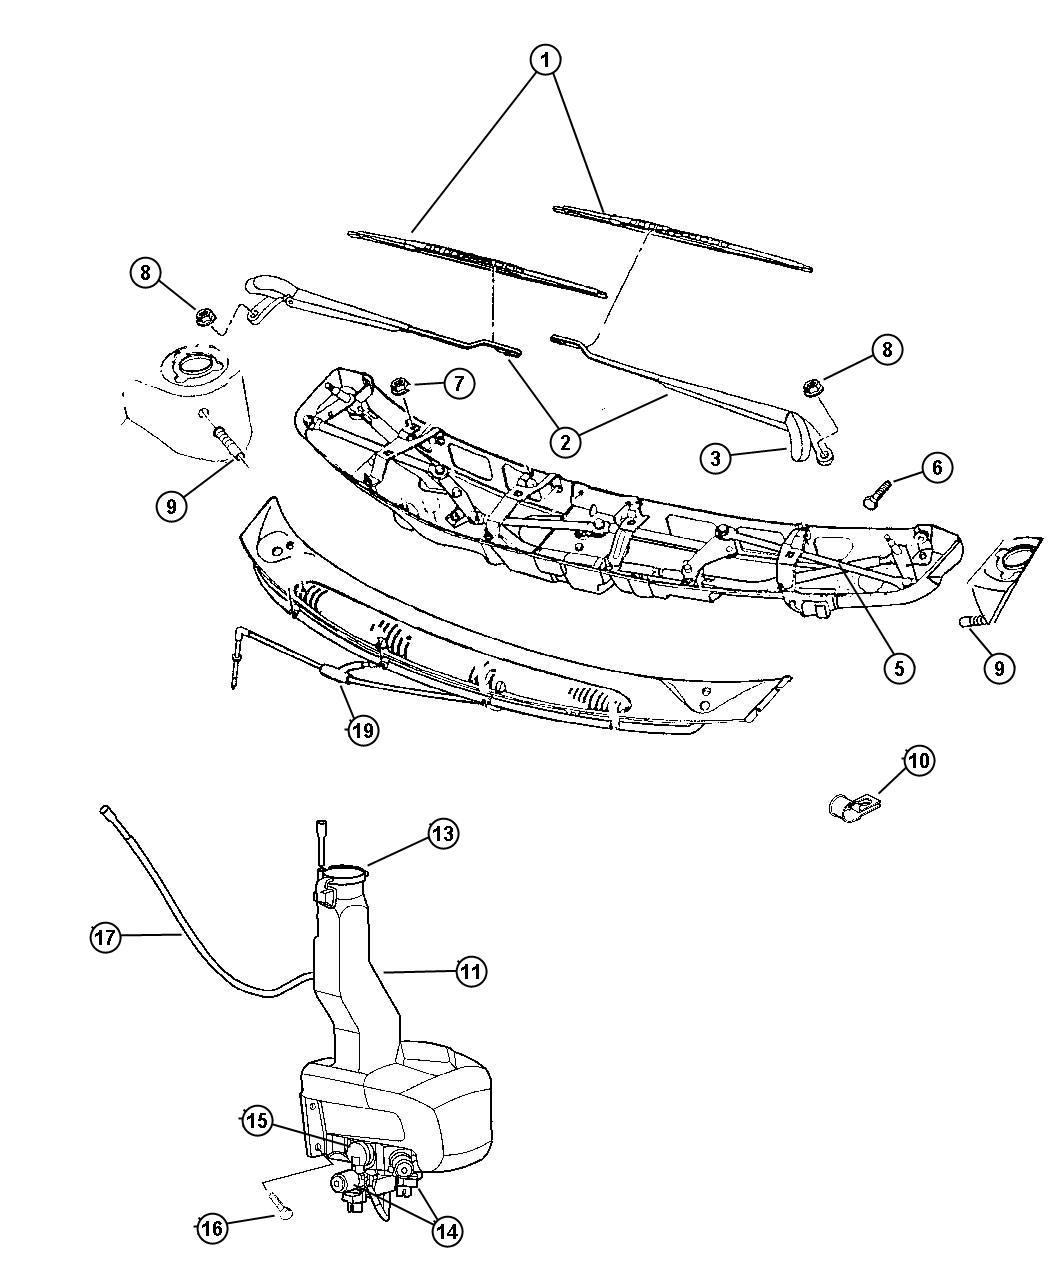 Dodge Ram Nozzle Washer Windshield Washer Wiper